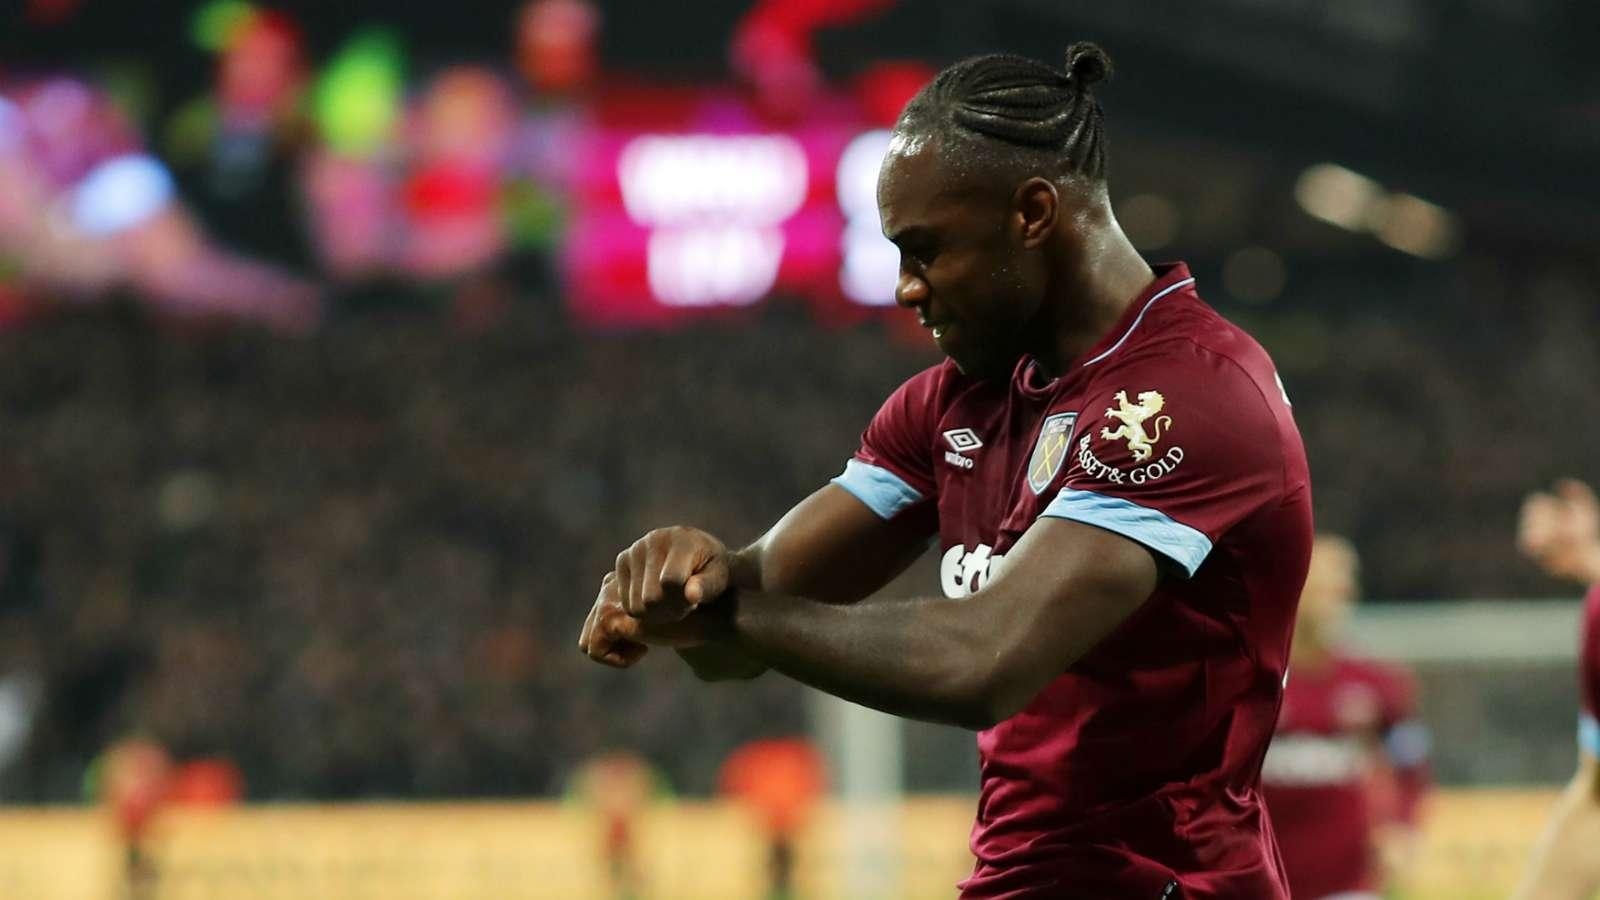 michail antonio 7q5lwysw1ksi10hav9qvftvm3 - West Ham vs Liverpool 1-1: Premier League Match Report & Highlights